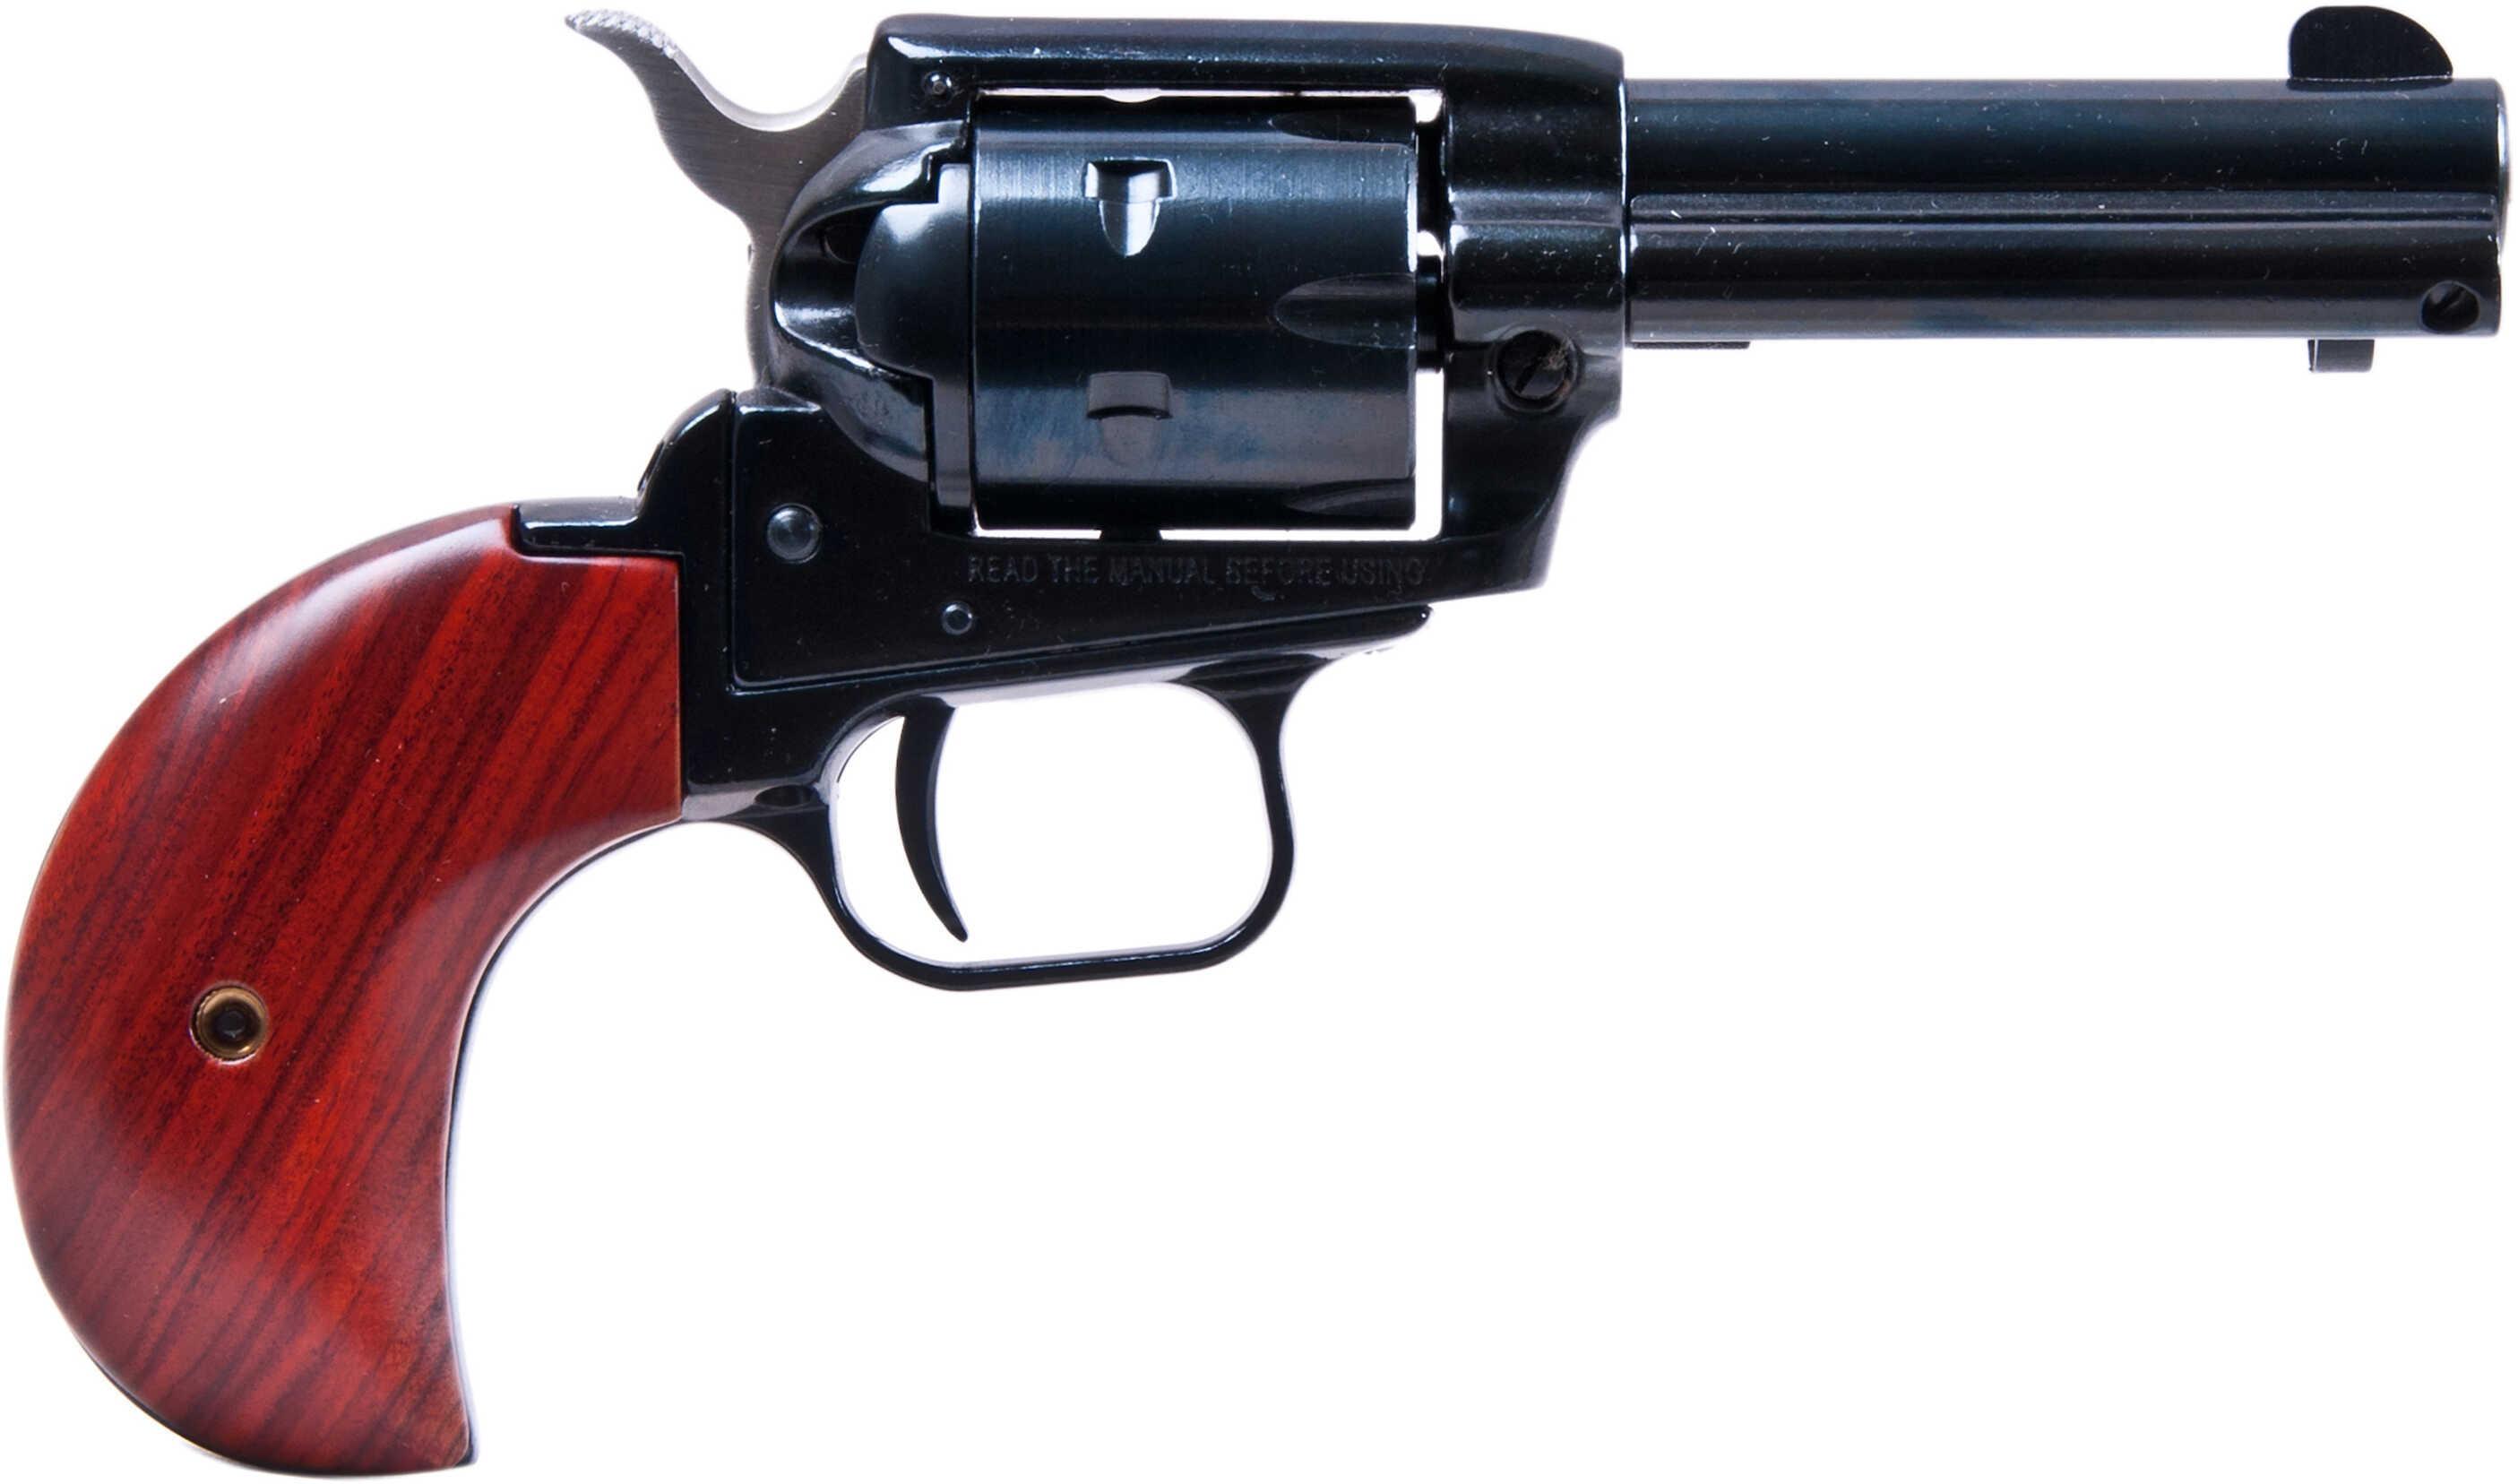 "Heritage Rough Rider Revolver SAA 22 Long Rifle / Mag 3.5"" Barrel Blue Finish Bird Head Wood Polished Grip RR22MB3BH"